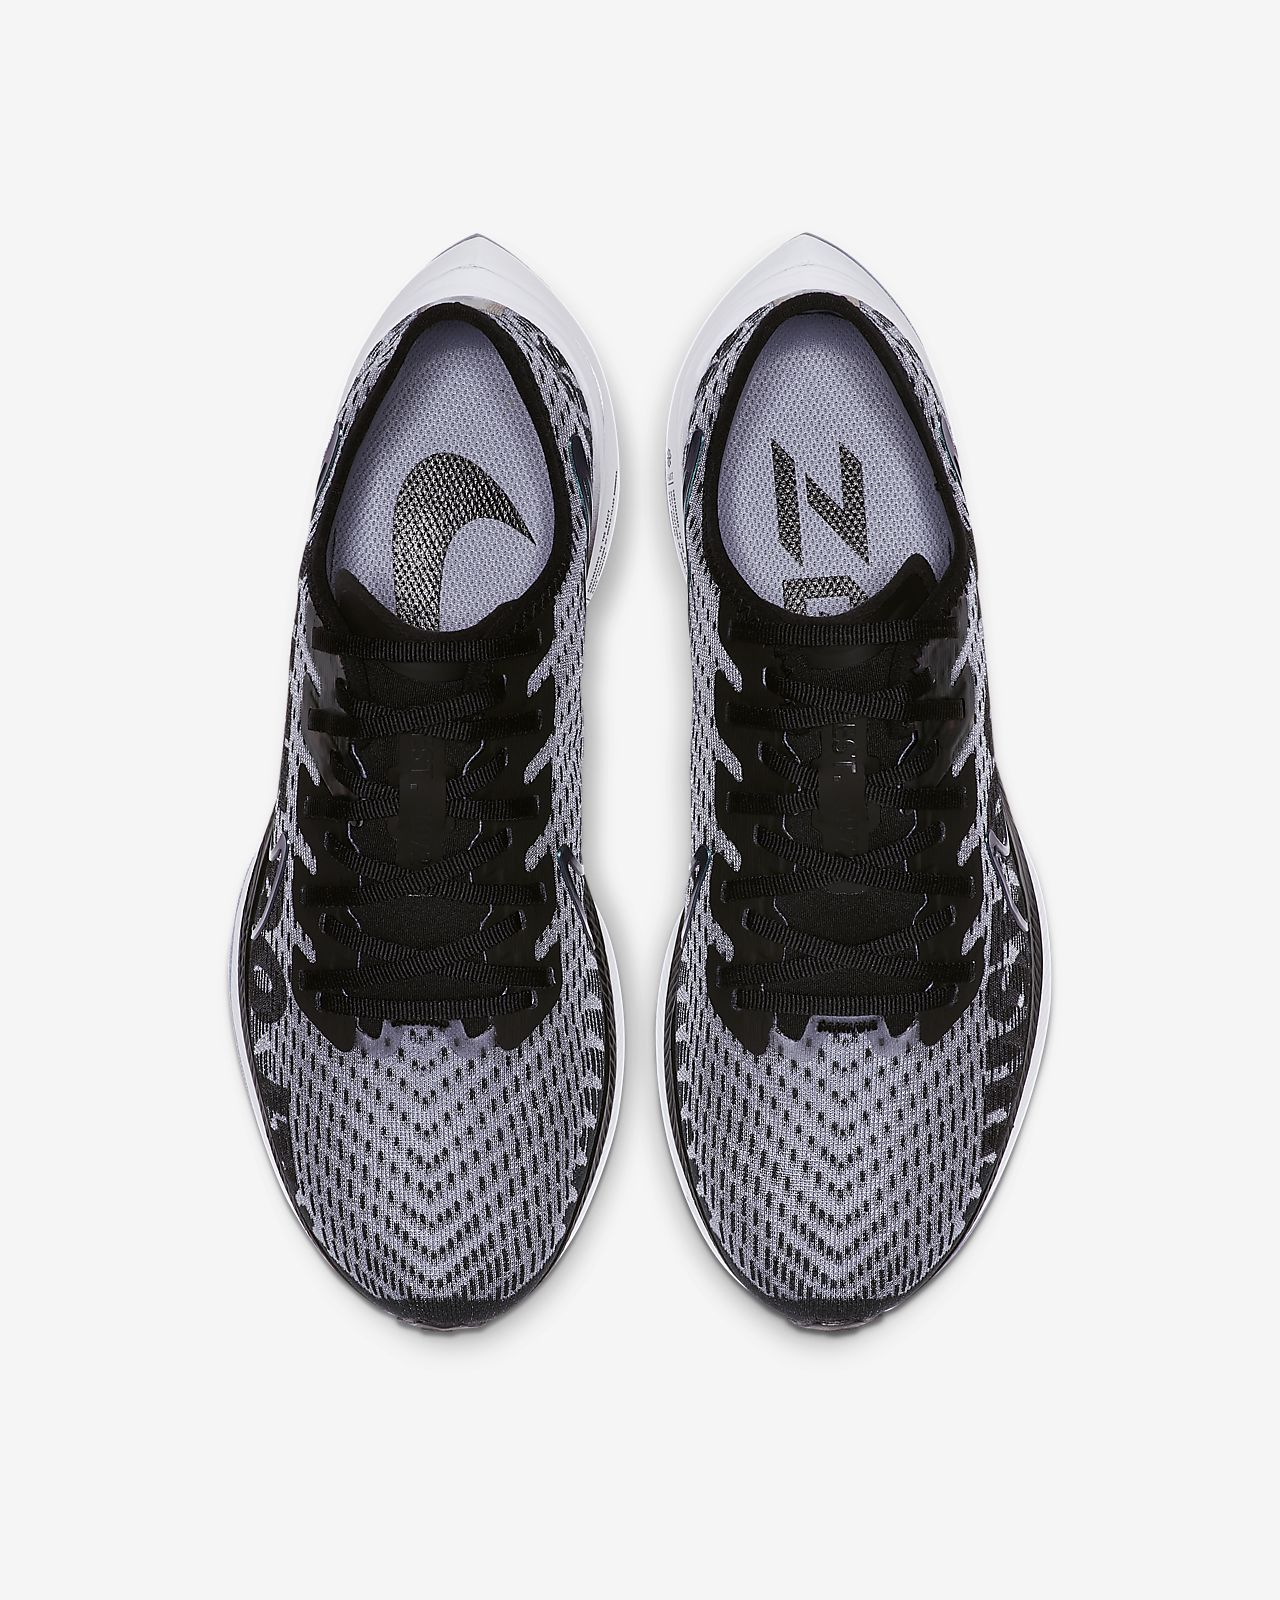 Zapatillas Mujer Nike Zoom Pegasus Turbo 2 Rise Negro